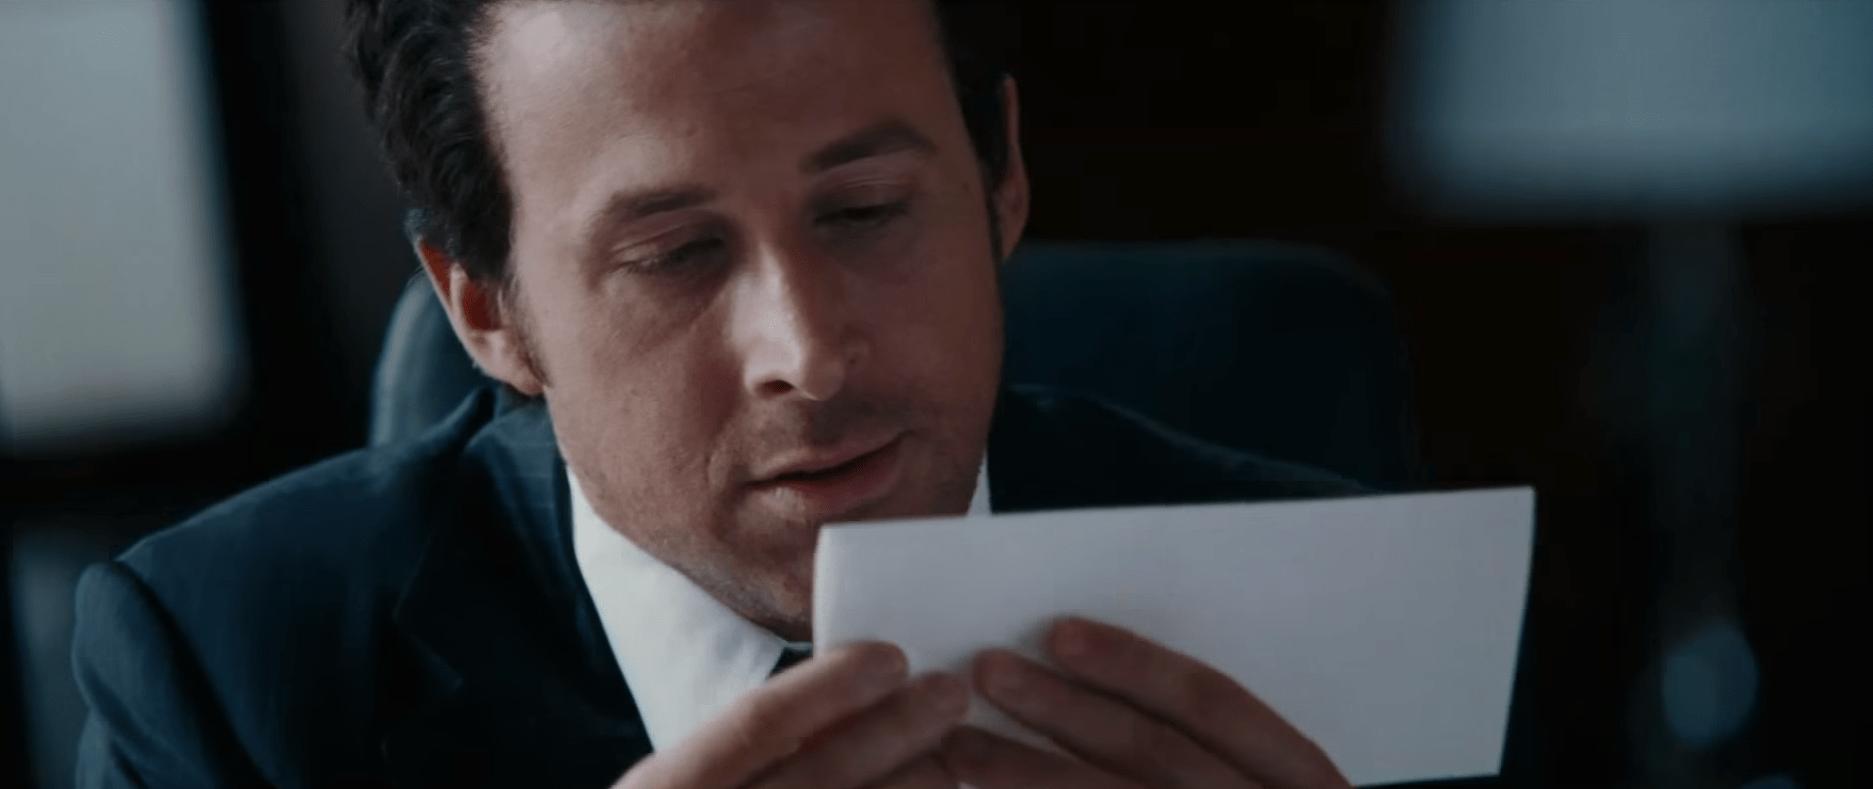 Ryan Gosling in The Big Short